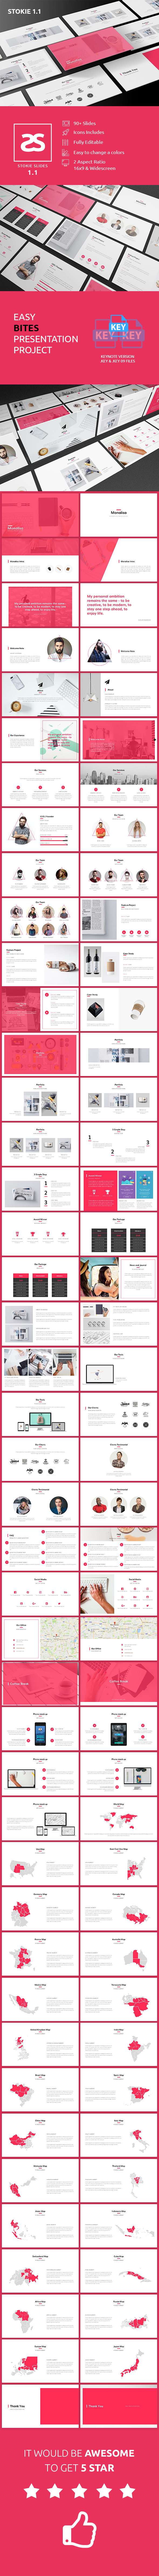 GraphicRiver Creative Keynote Template 1.1 20746385